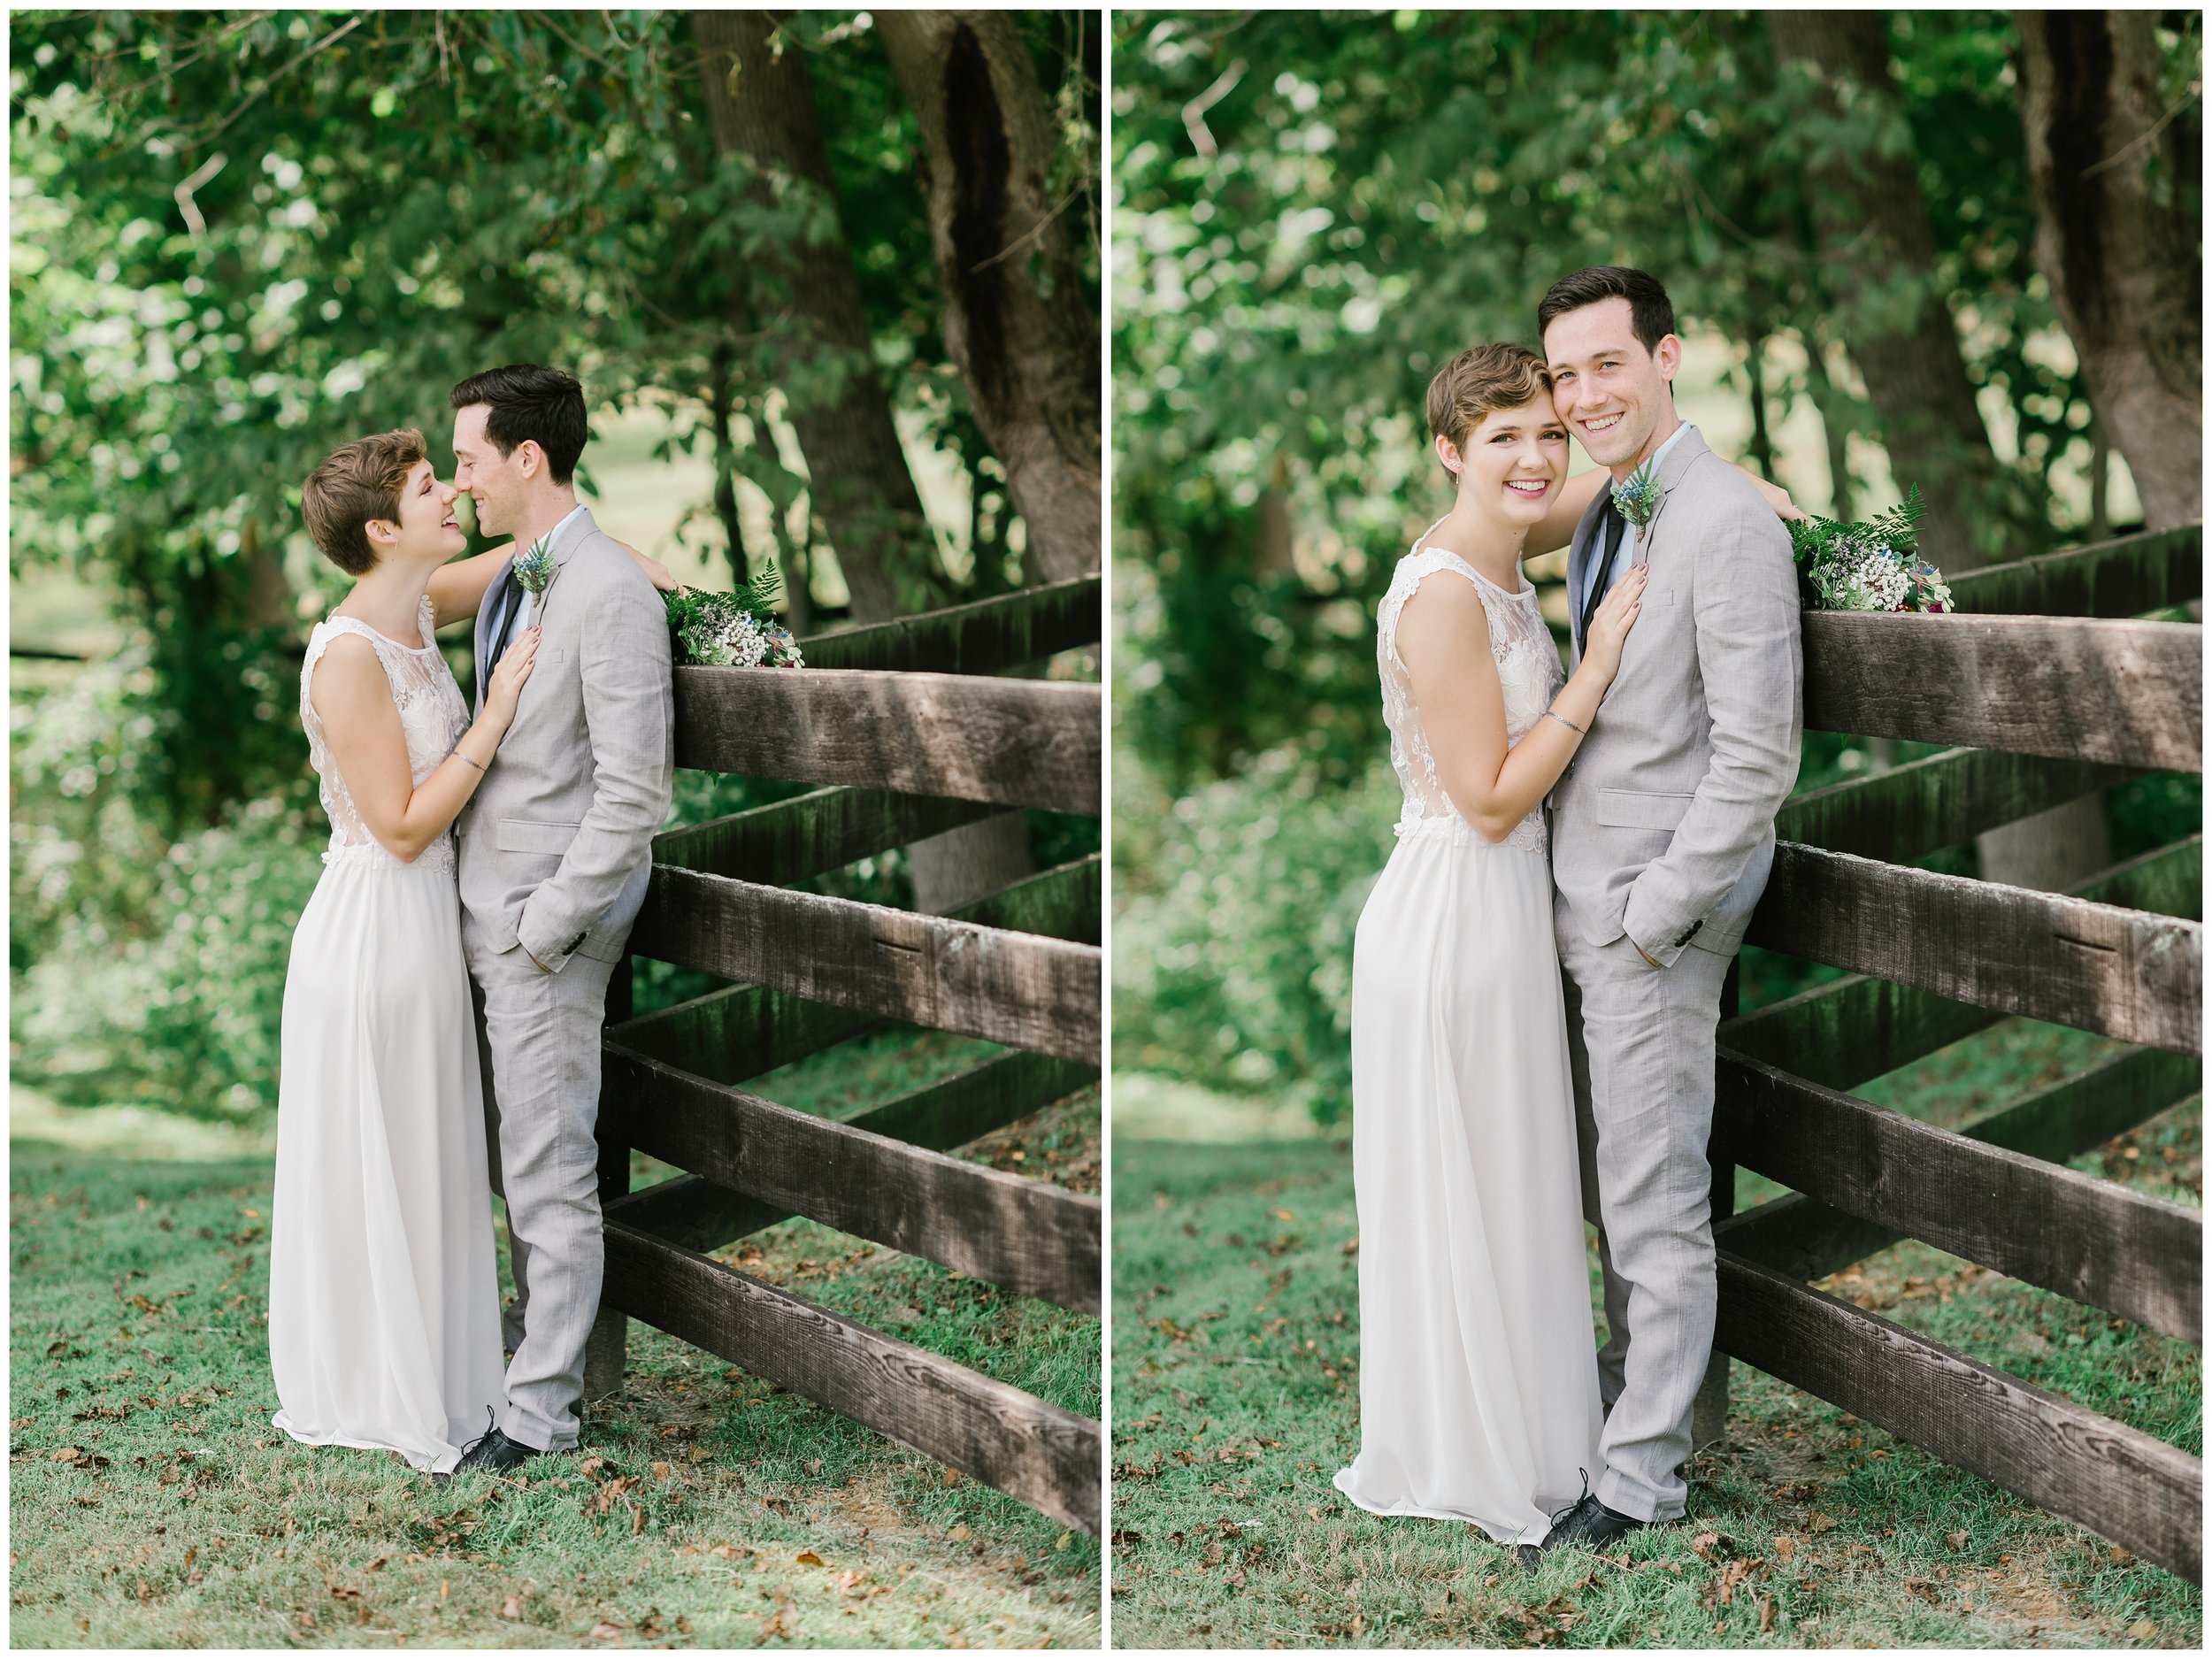 Rebecca_Shehorn_Photography_Indianapolis_Wedding_Photographer_7228.jpg